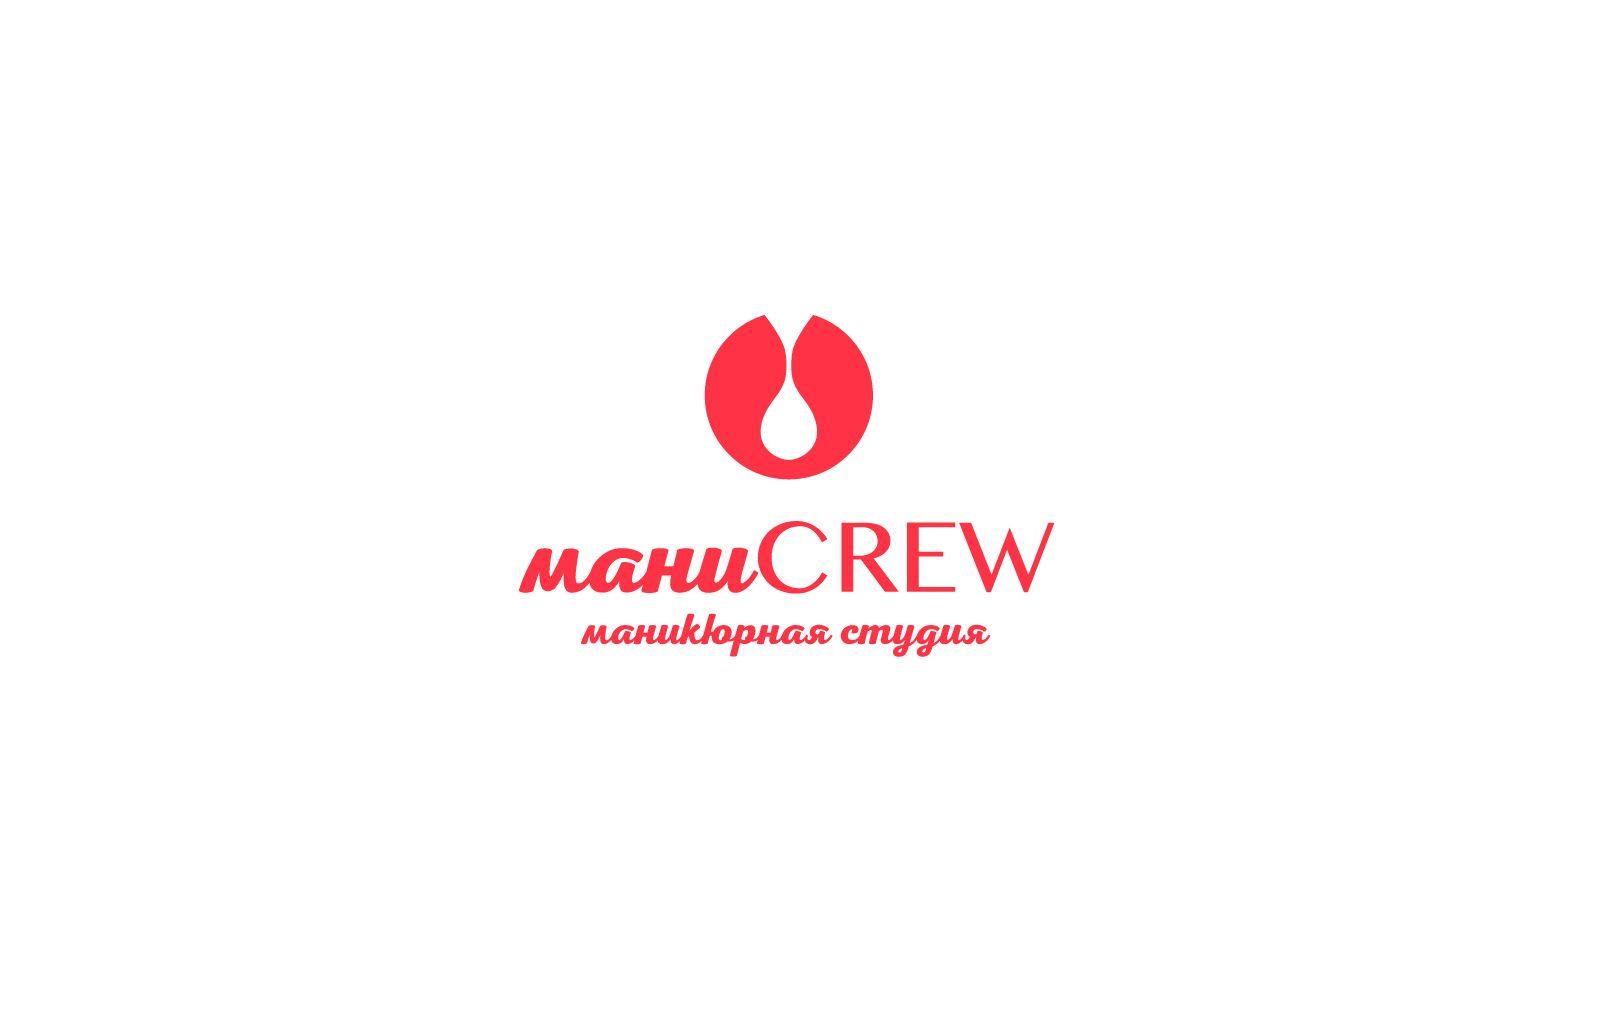 Логотип для маниCREW - дизайнер andblin61